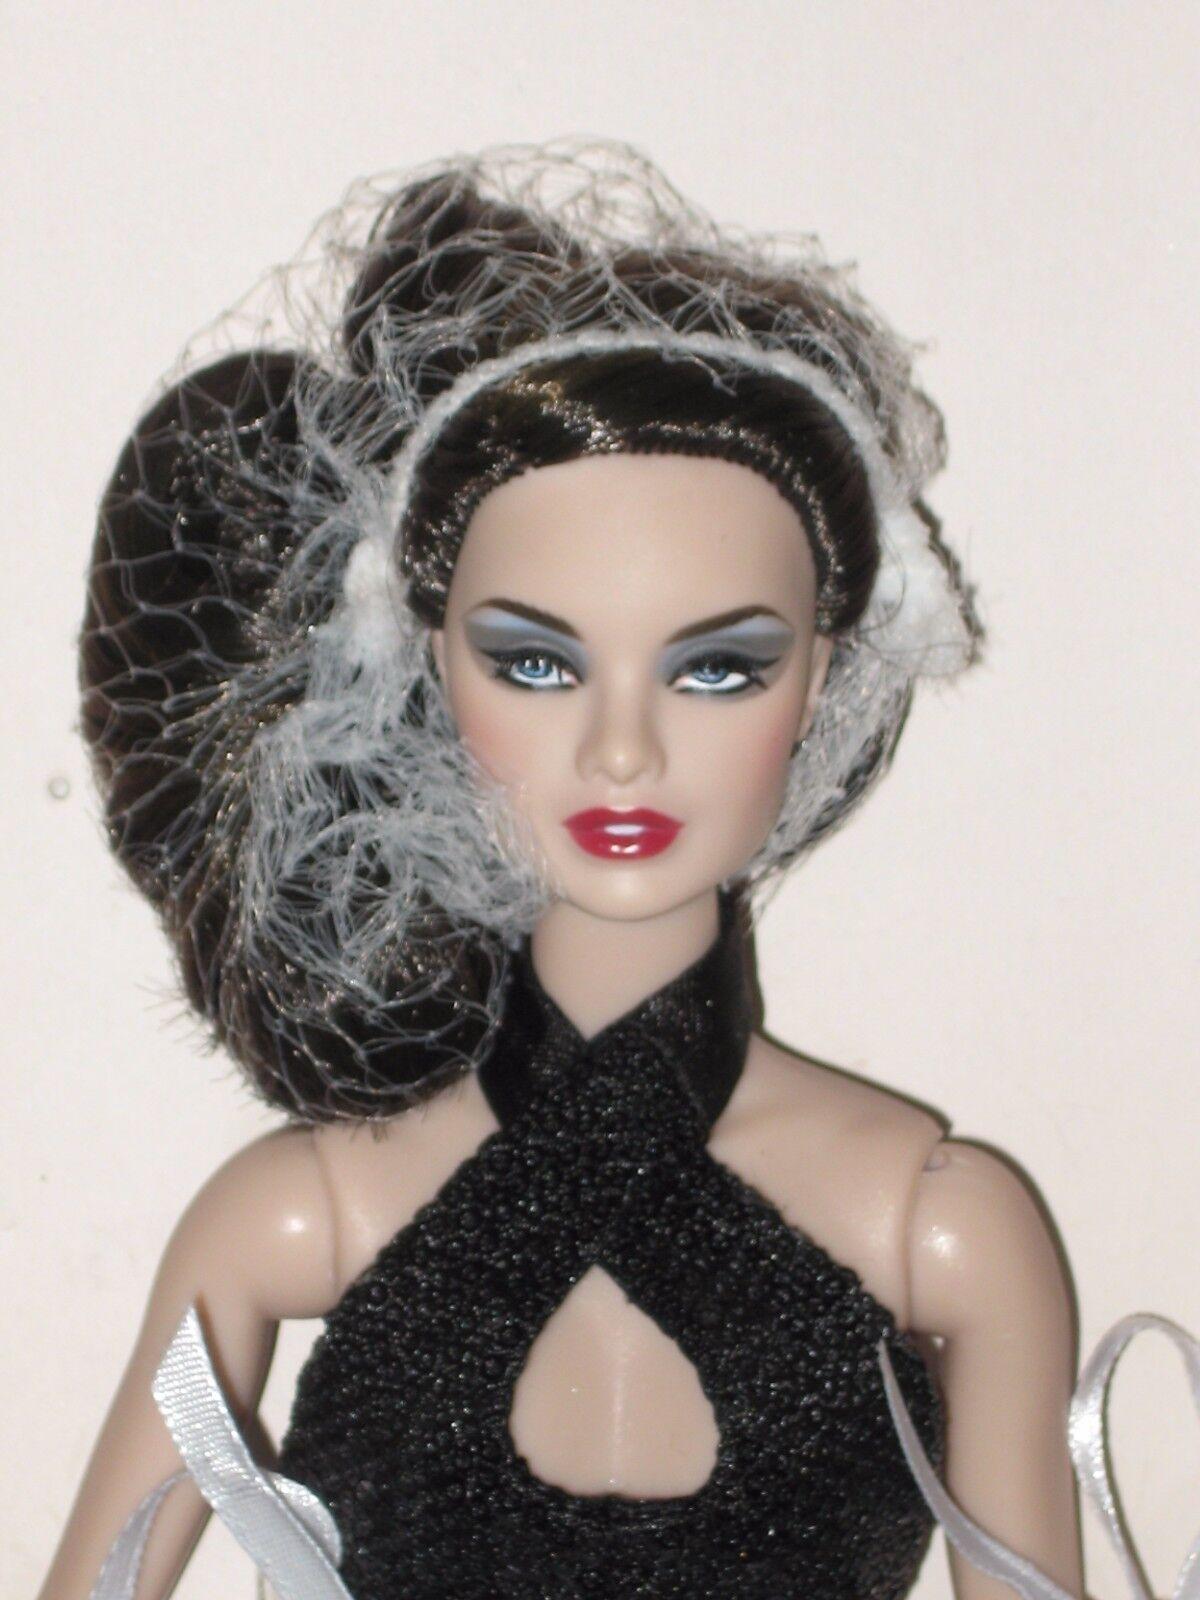 Fashion Royalty doll FR2 Gloss Convention NU.FACE Chrome Noir Erin Salston NRFB*